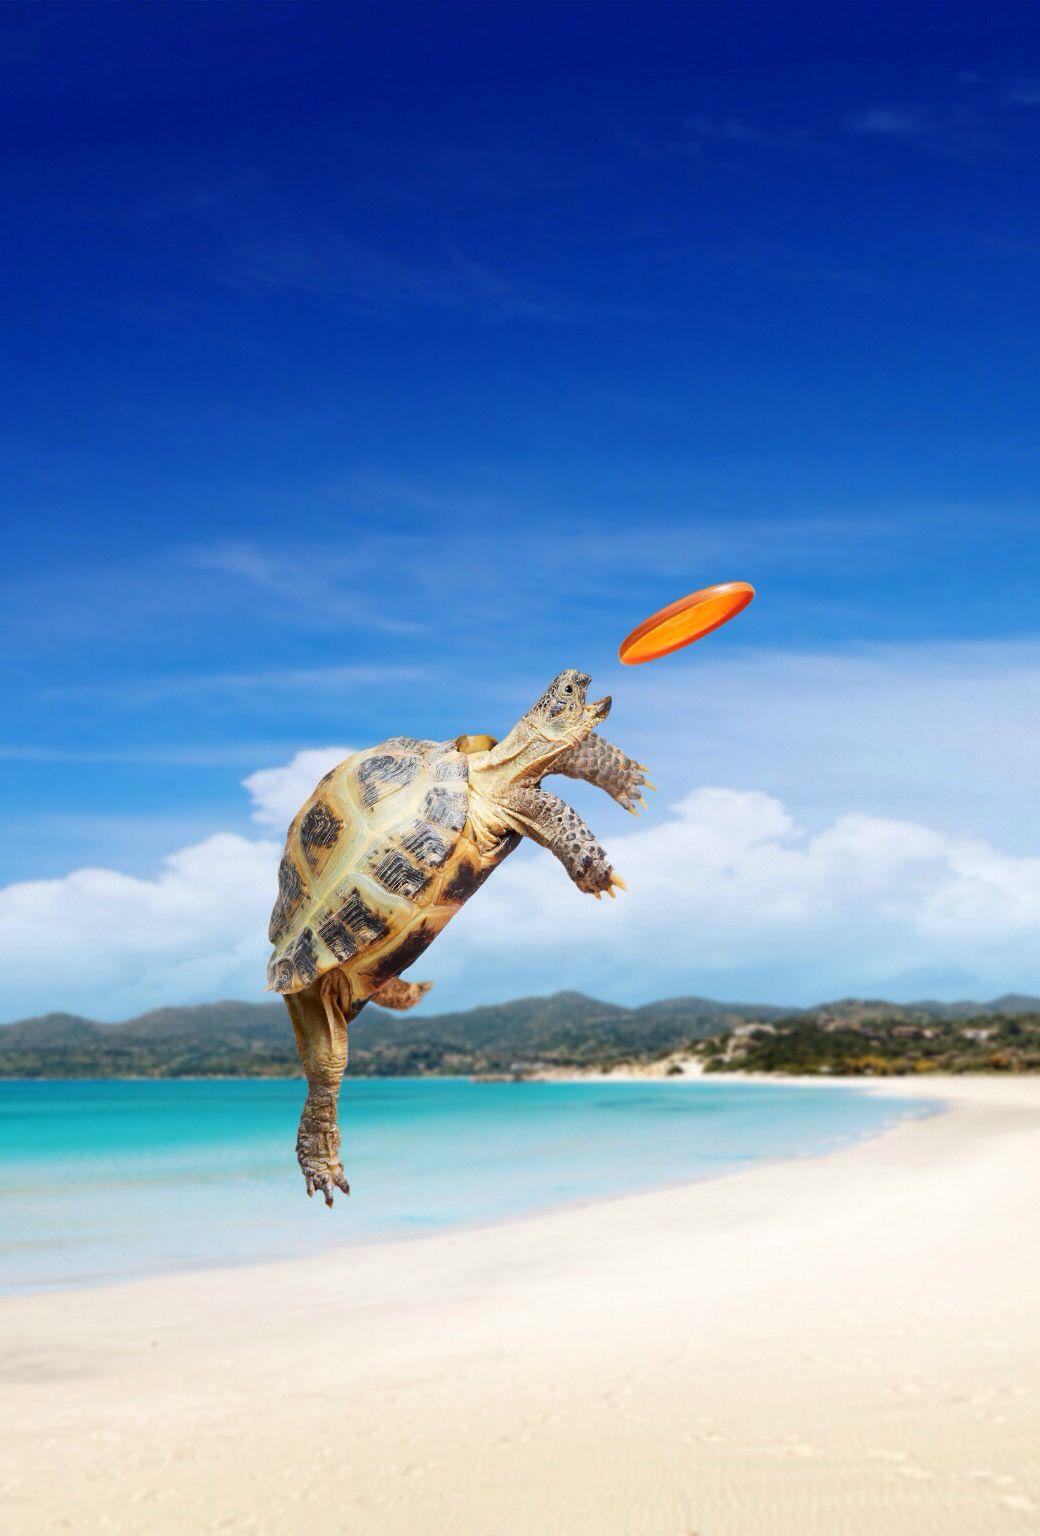 76a8185ddea525188b7d11c993f33d2d turtle catching a frisbee on a beach ios 7 wallpaper accessories